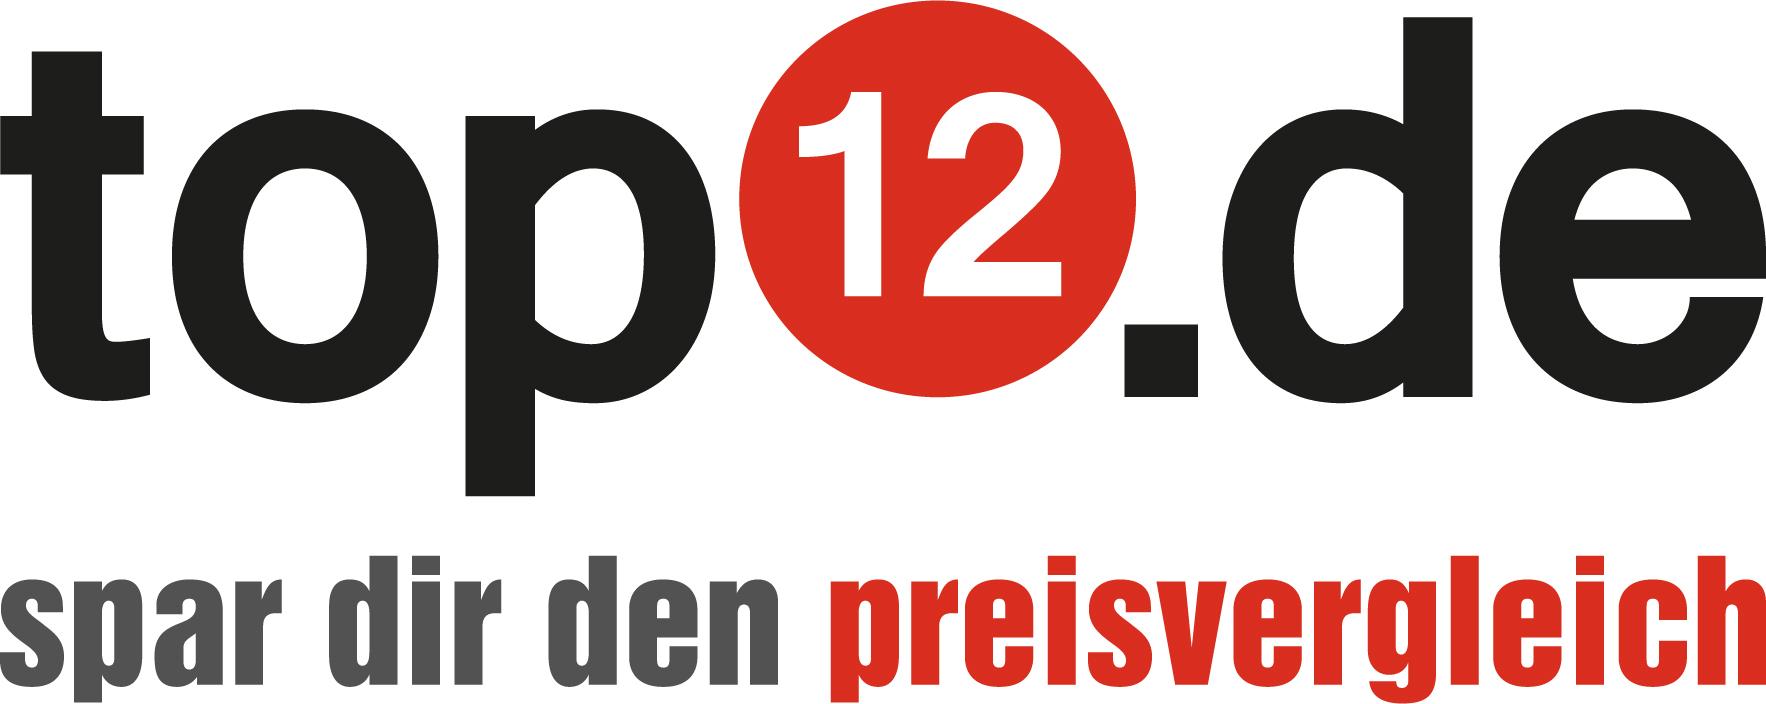 12 x 12 Cent Artikel Versandkostenfrei bei top12.de